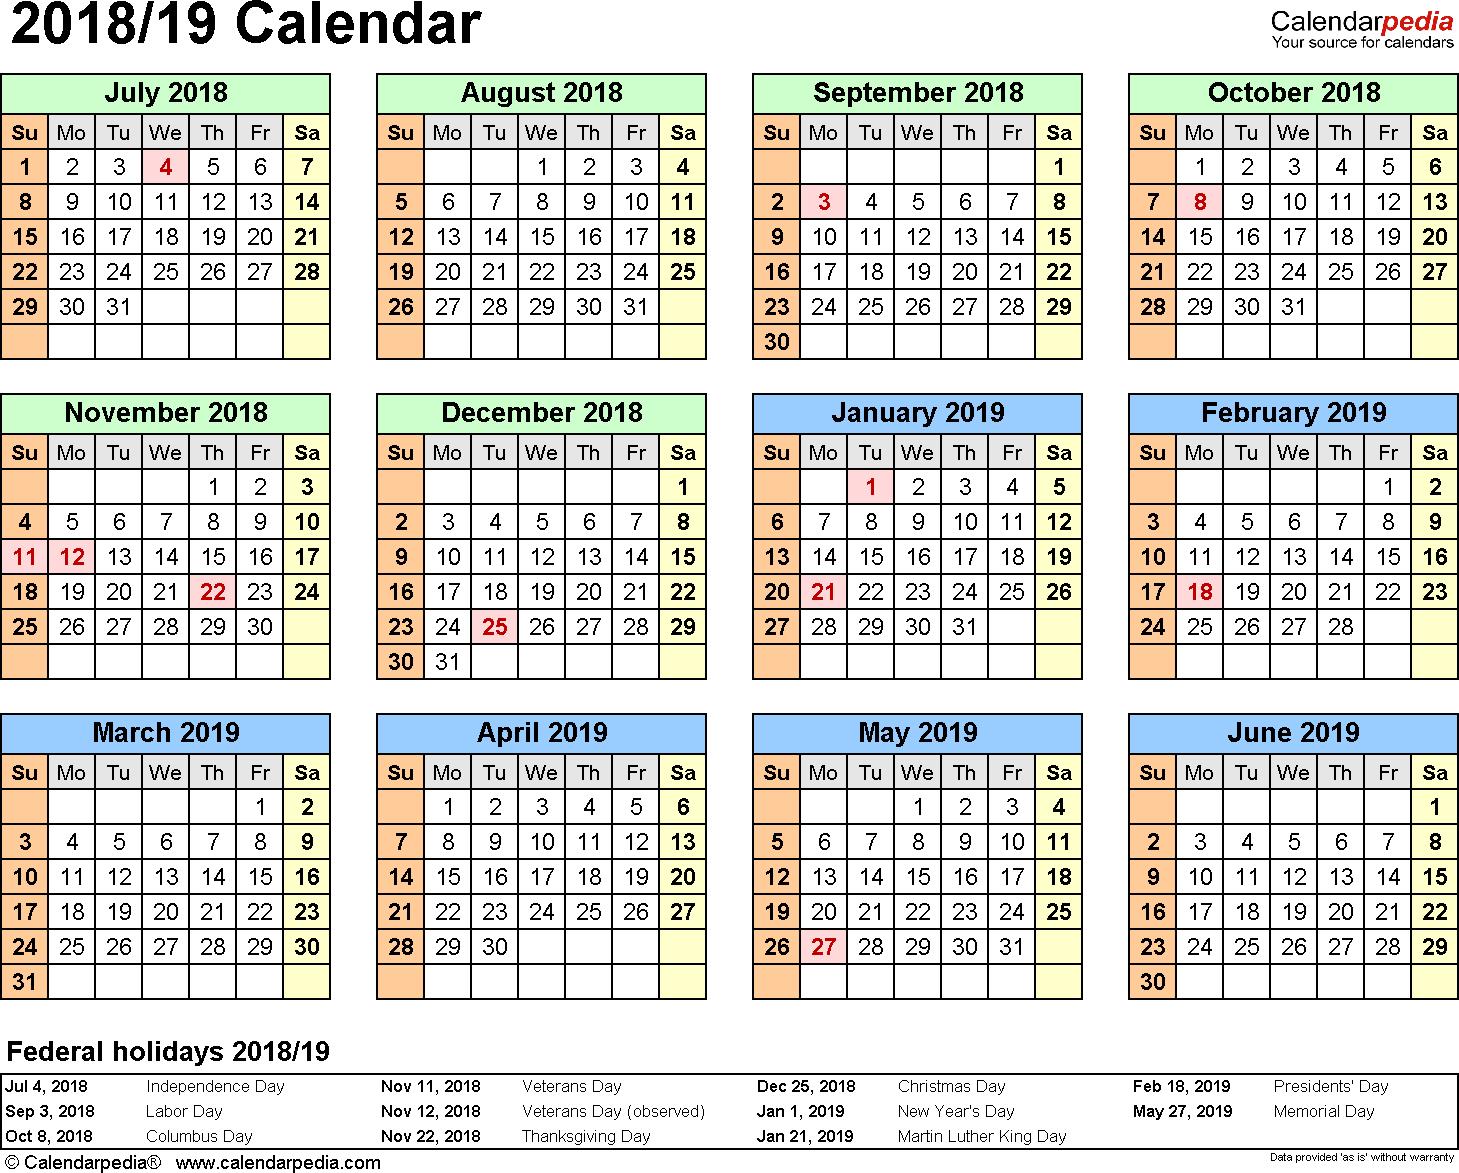 Split Year Calendars 2018/2019 (July To June) - Pdf Templates